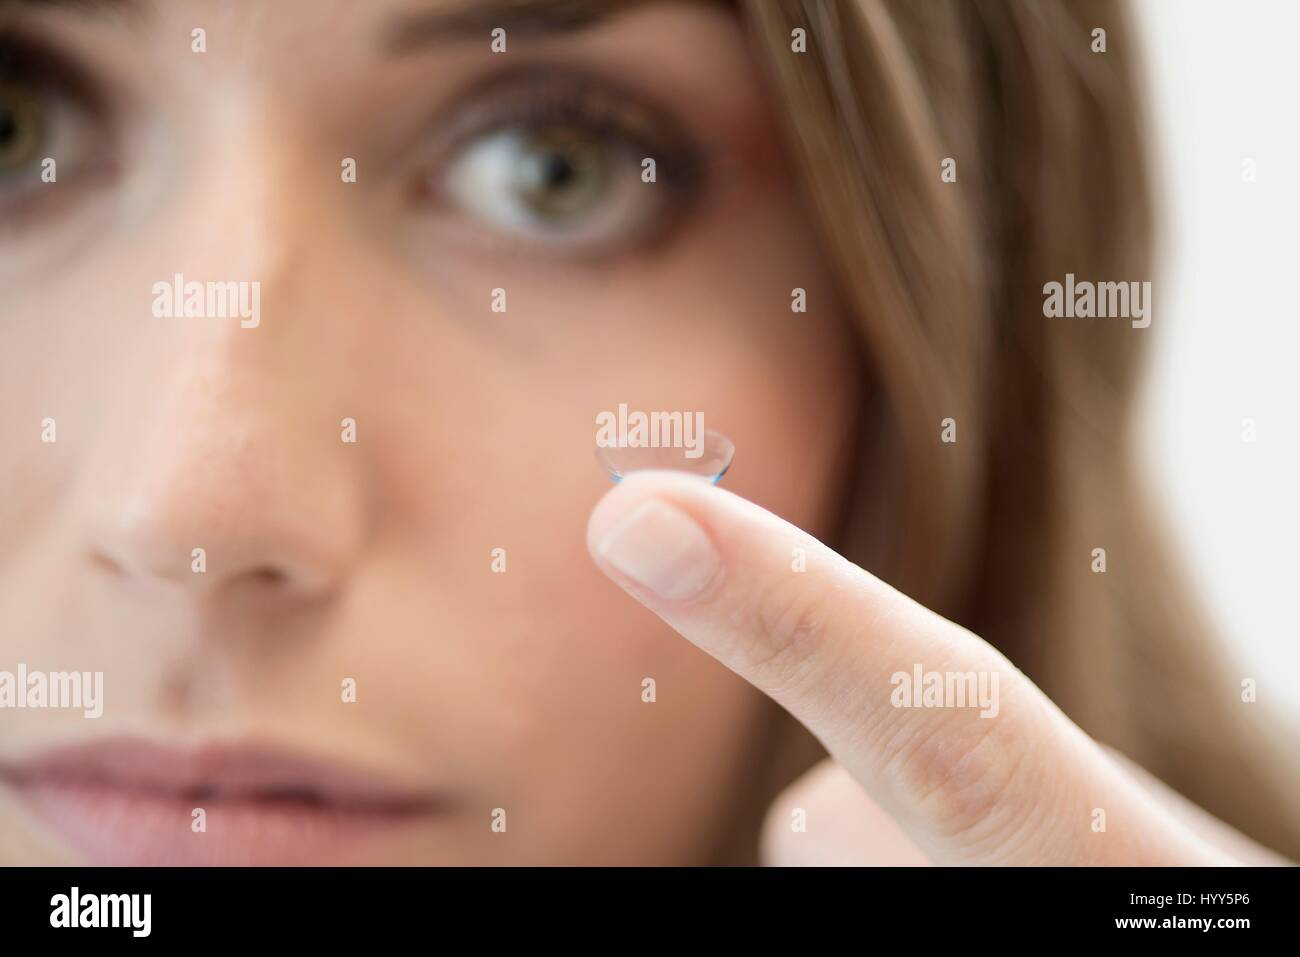 Mitte Erwachsene Frau mit Kontaktlinsen am Finger. Stockbild